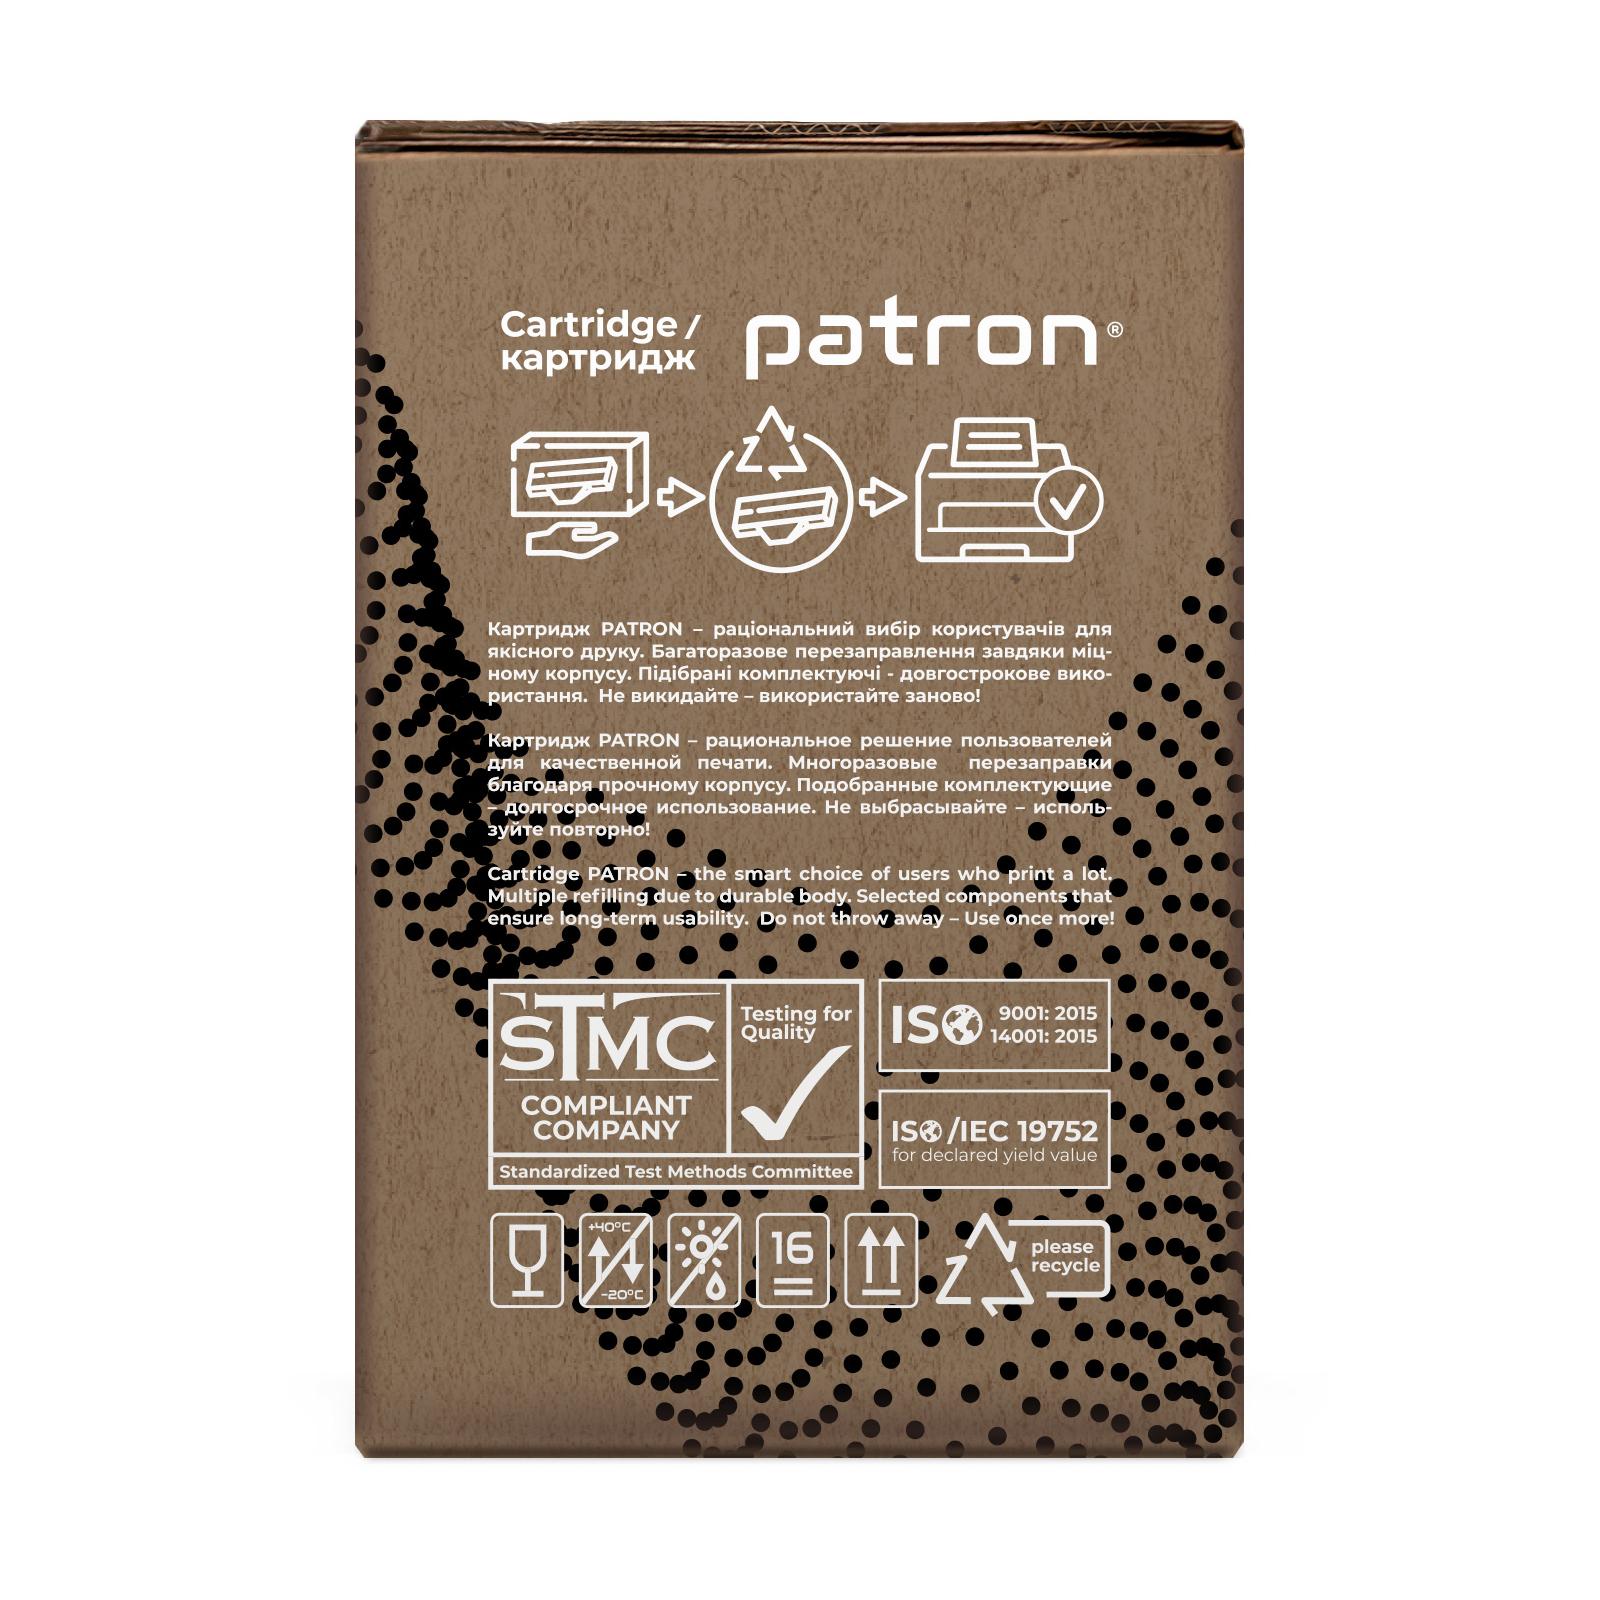 Картридж PATRON XEROX Ph 3140 (108R00908) Extra (PN-00908R) изображение 4